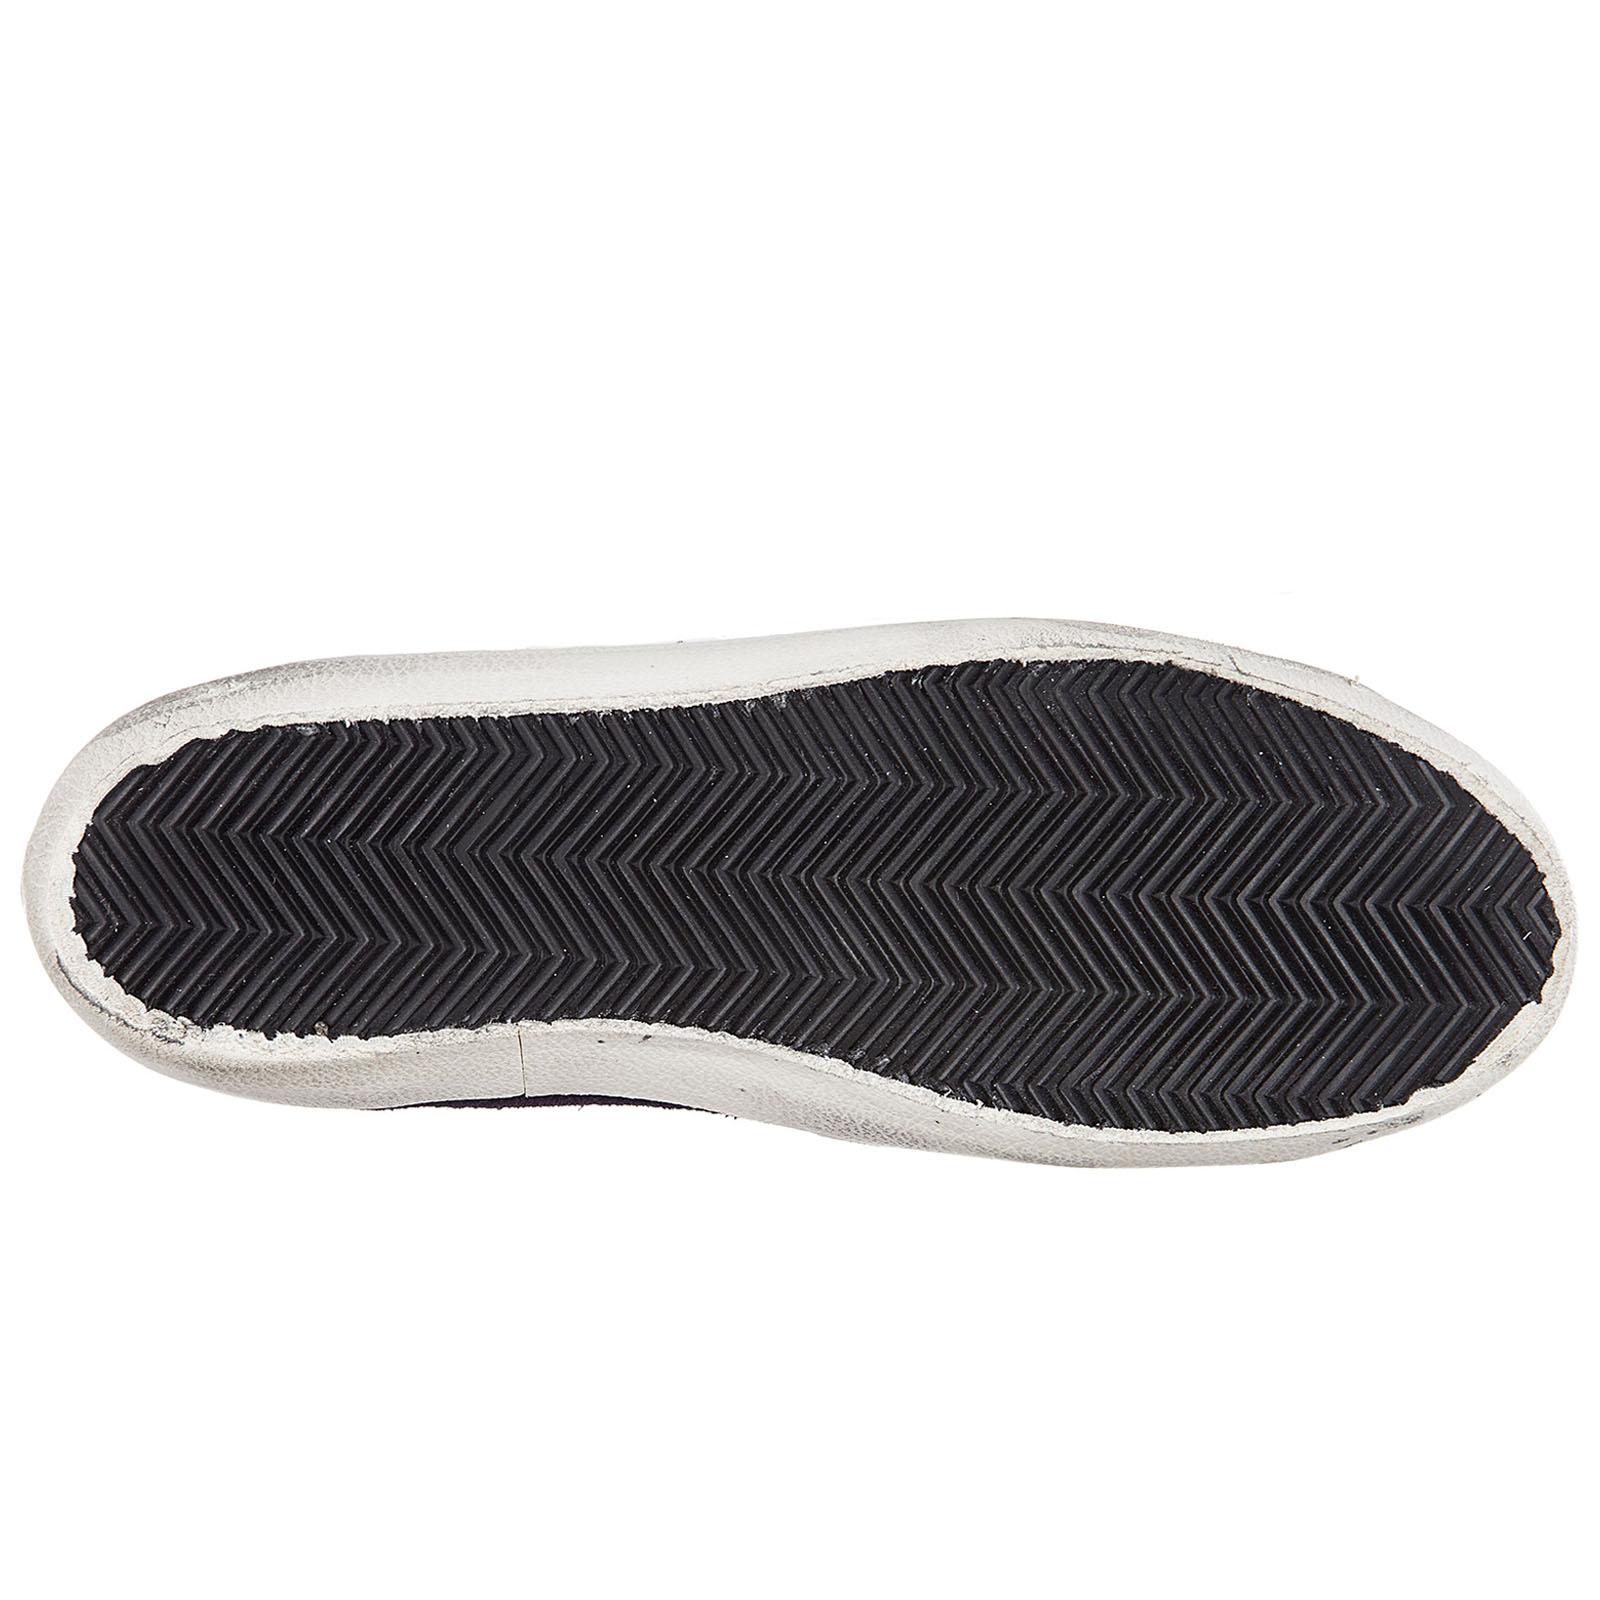 Chaussures baskets sneakers homme en daim superstar